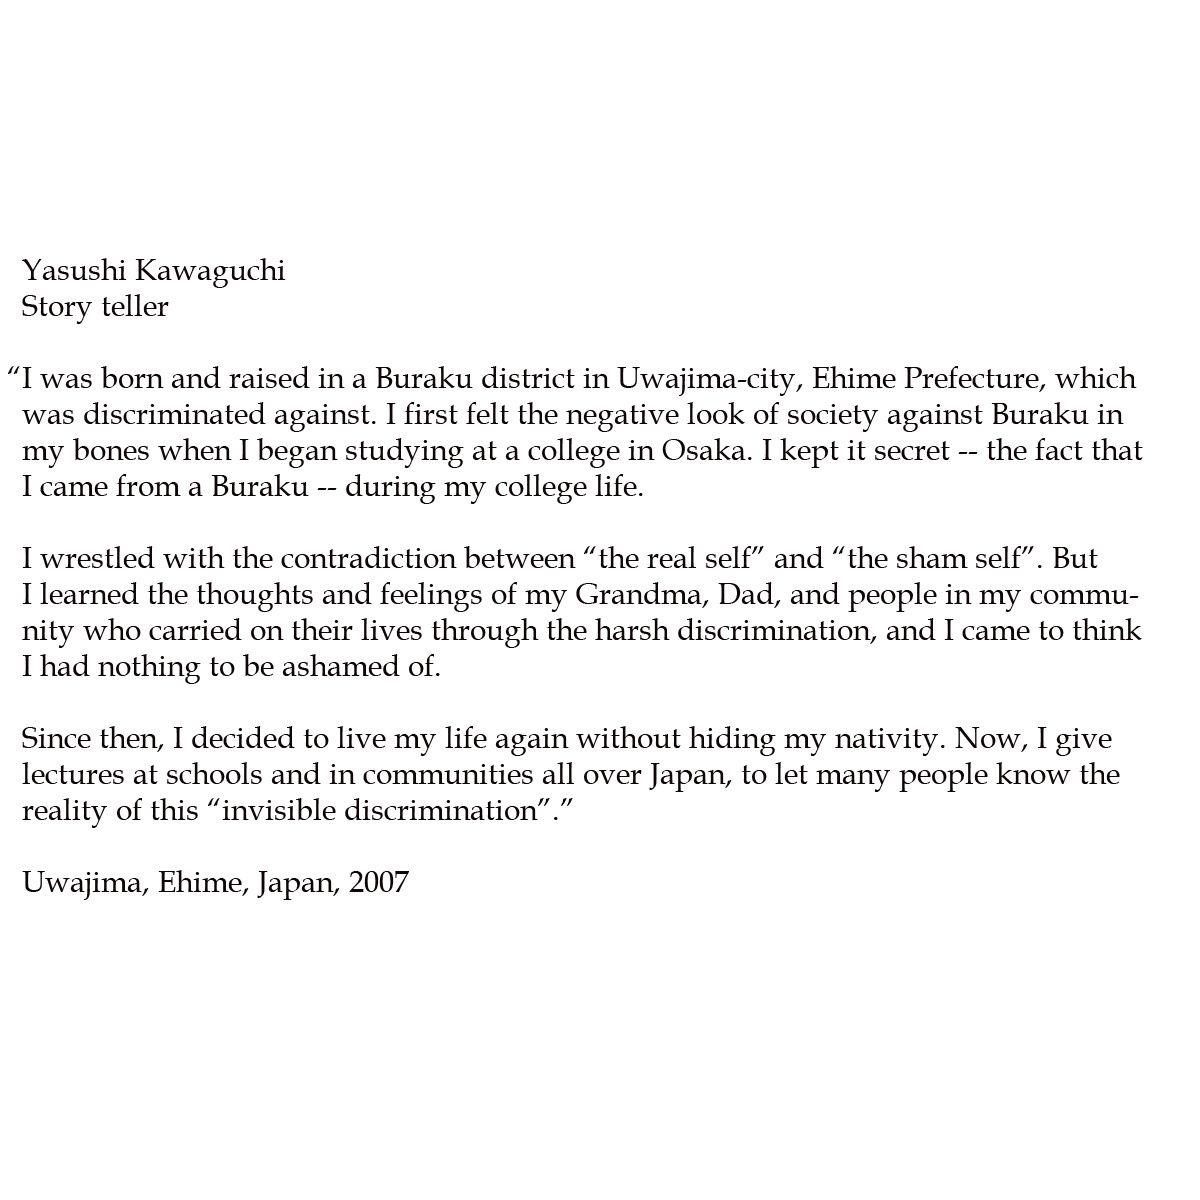 Yasushi Kawaguchi. Story teller.